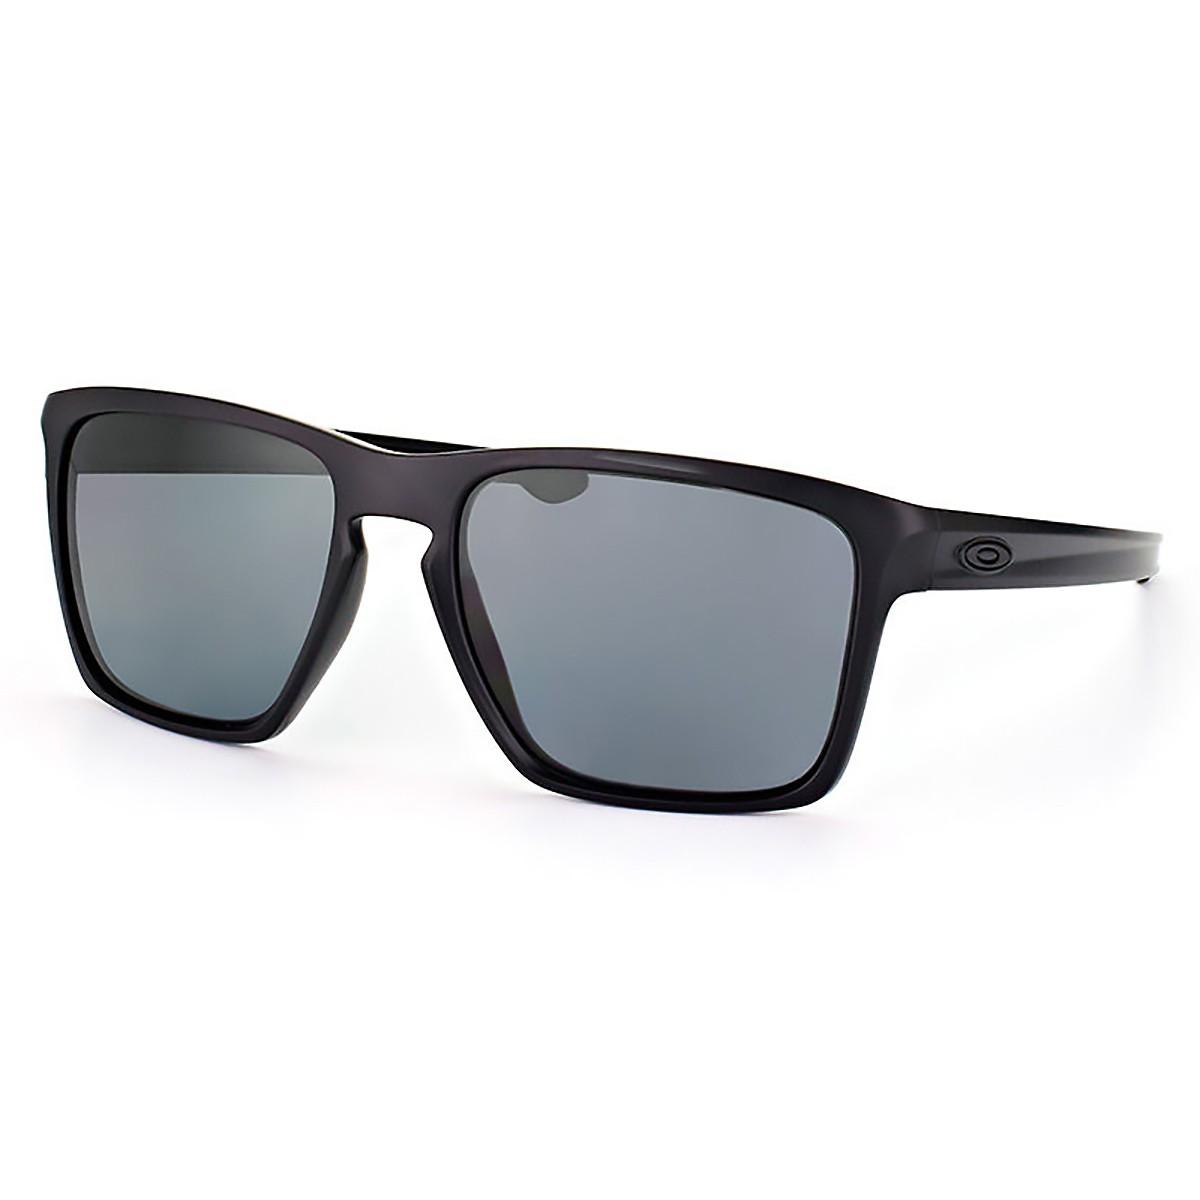 5309fd817ab94 Compre Óculos de Sol Oakley Sliver XL em 10X   Tri-Jóia Shop